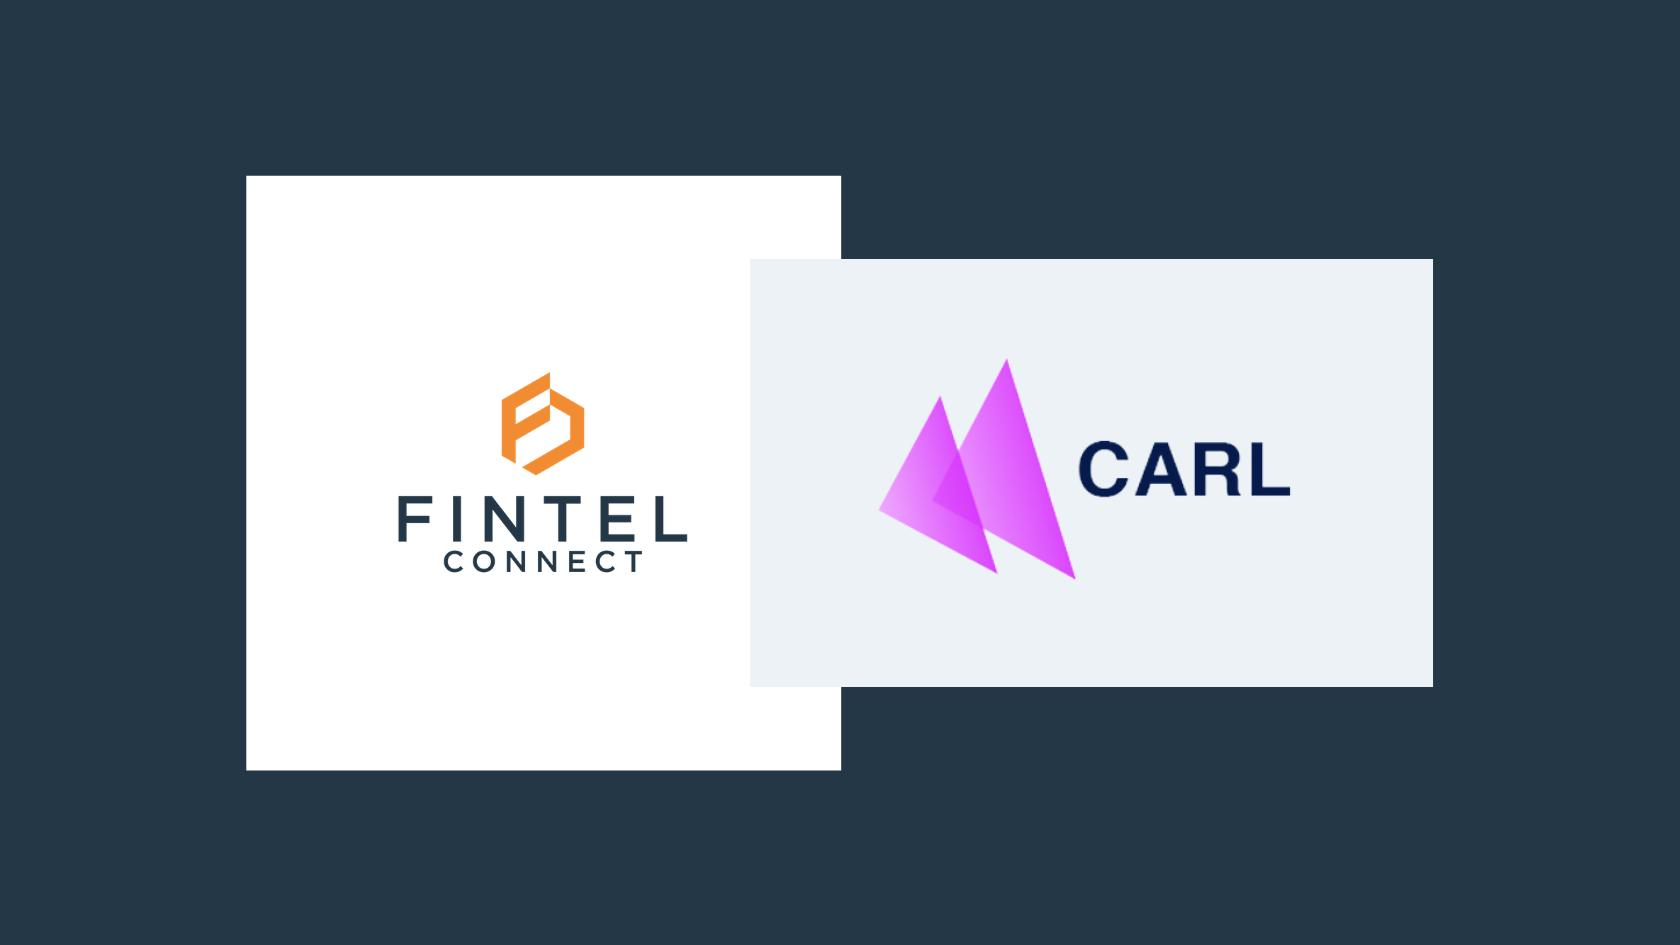 carl fintel connect partnerships